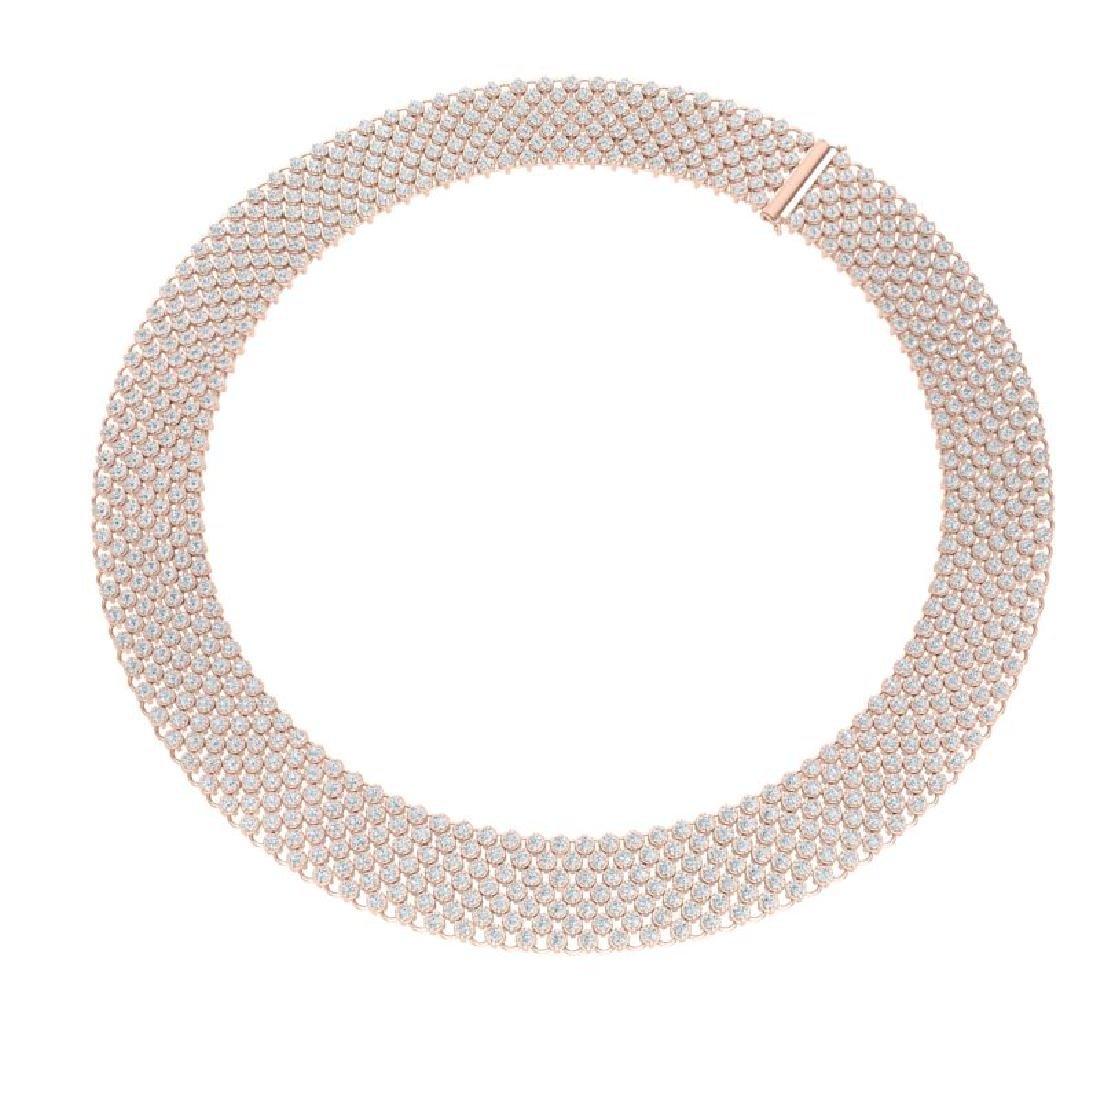 35 CTW Certified VS/SI Diamond Necklace 18K Rose Gold - 3